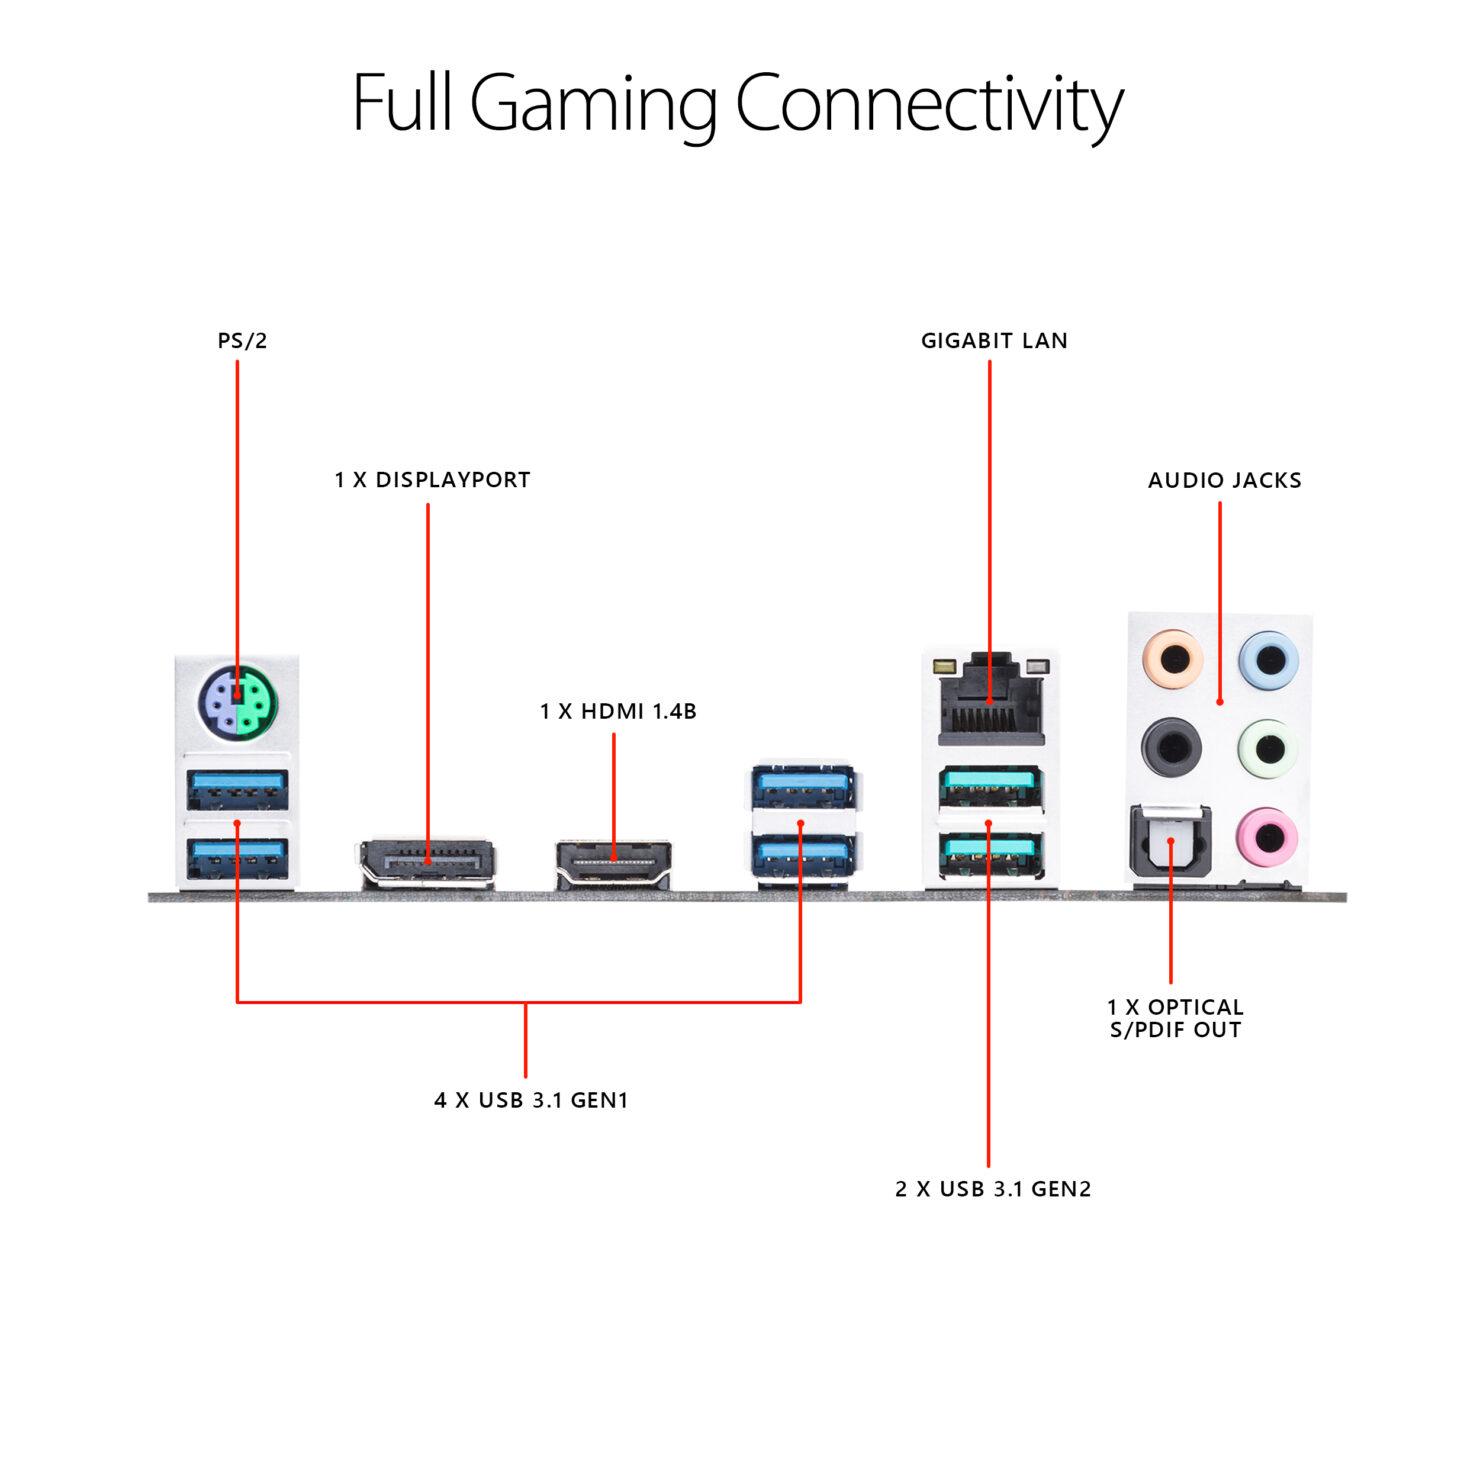 5-tuf-z390-pro-gaming-full-gaming-connectivity